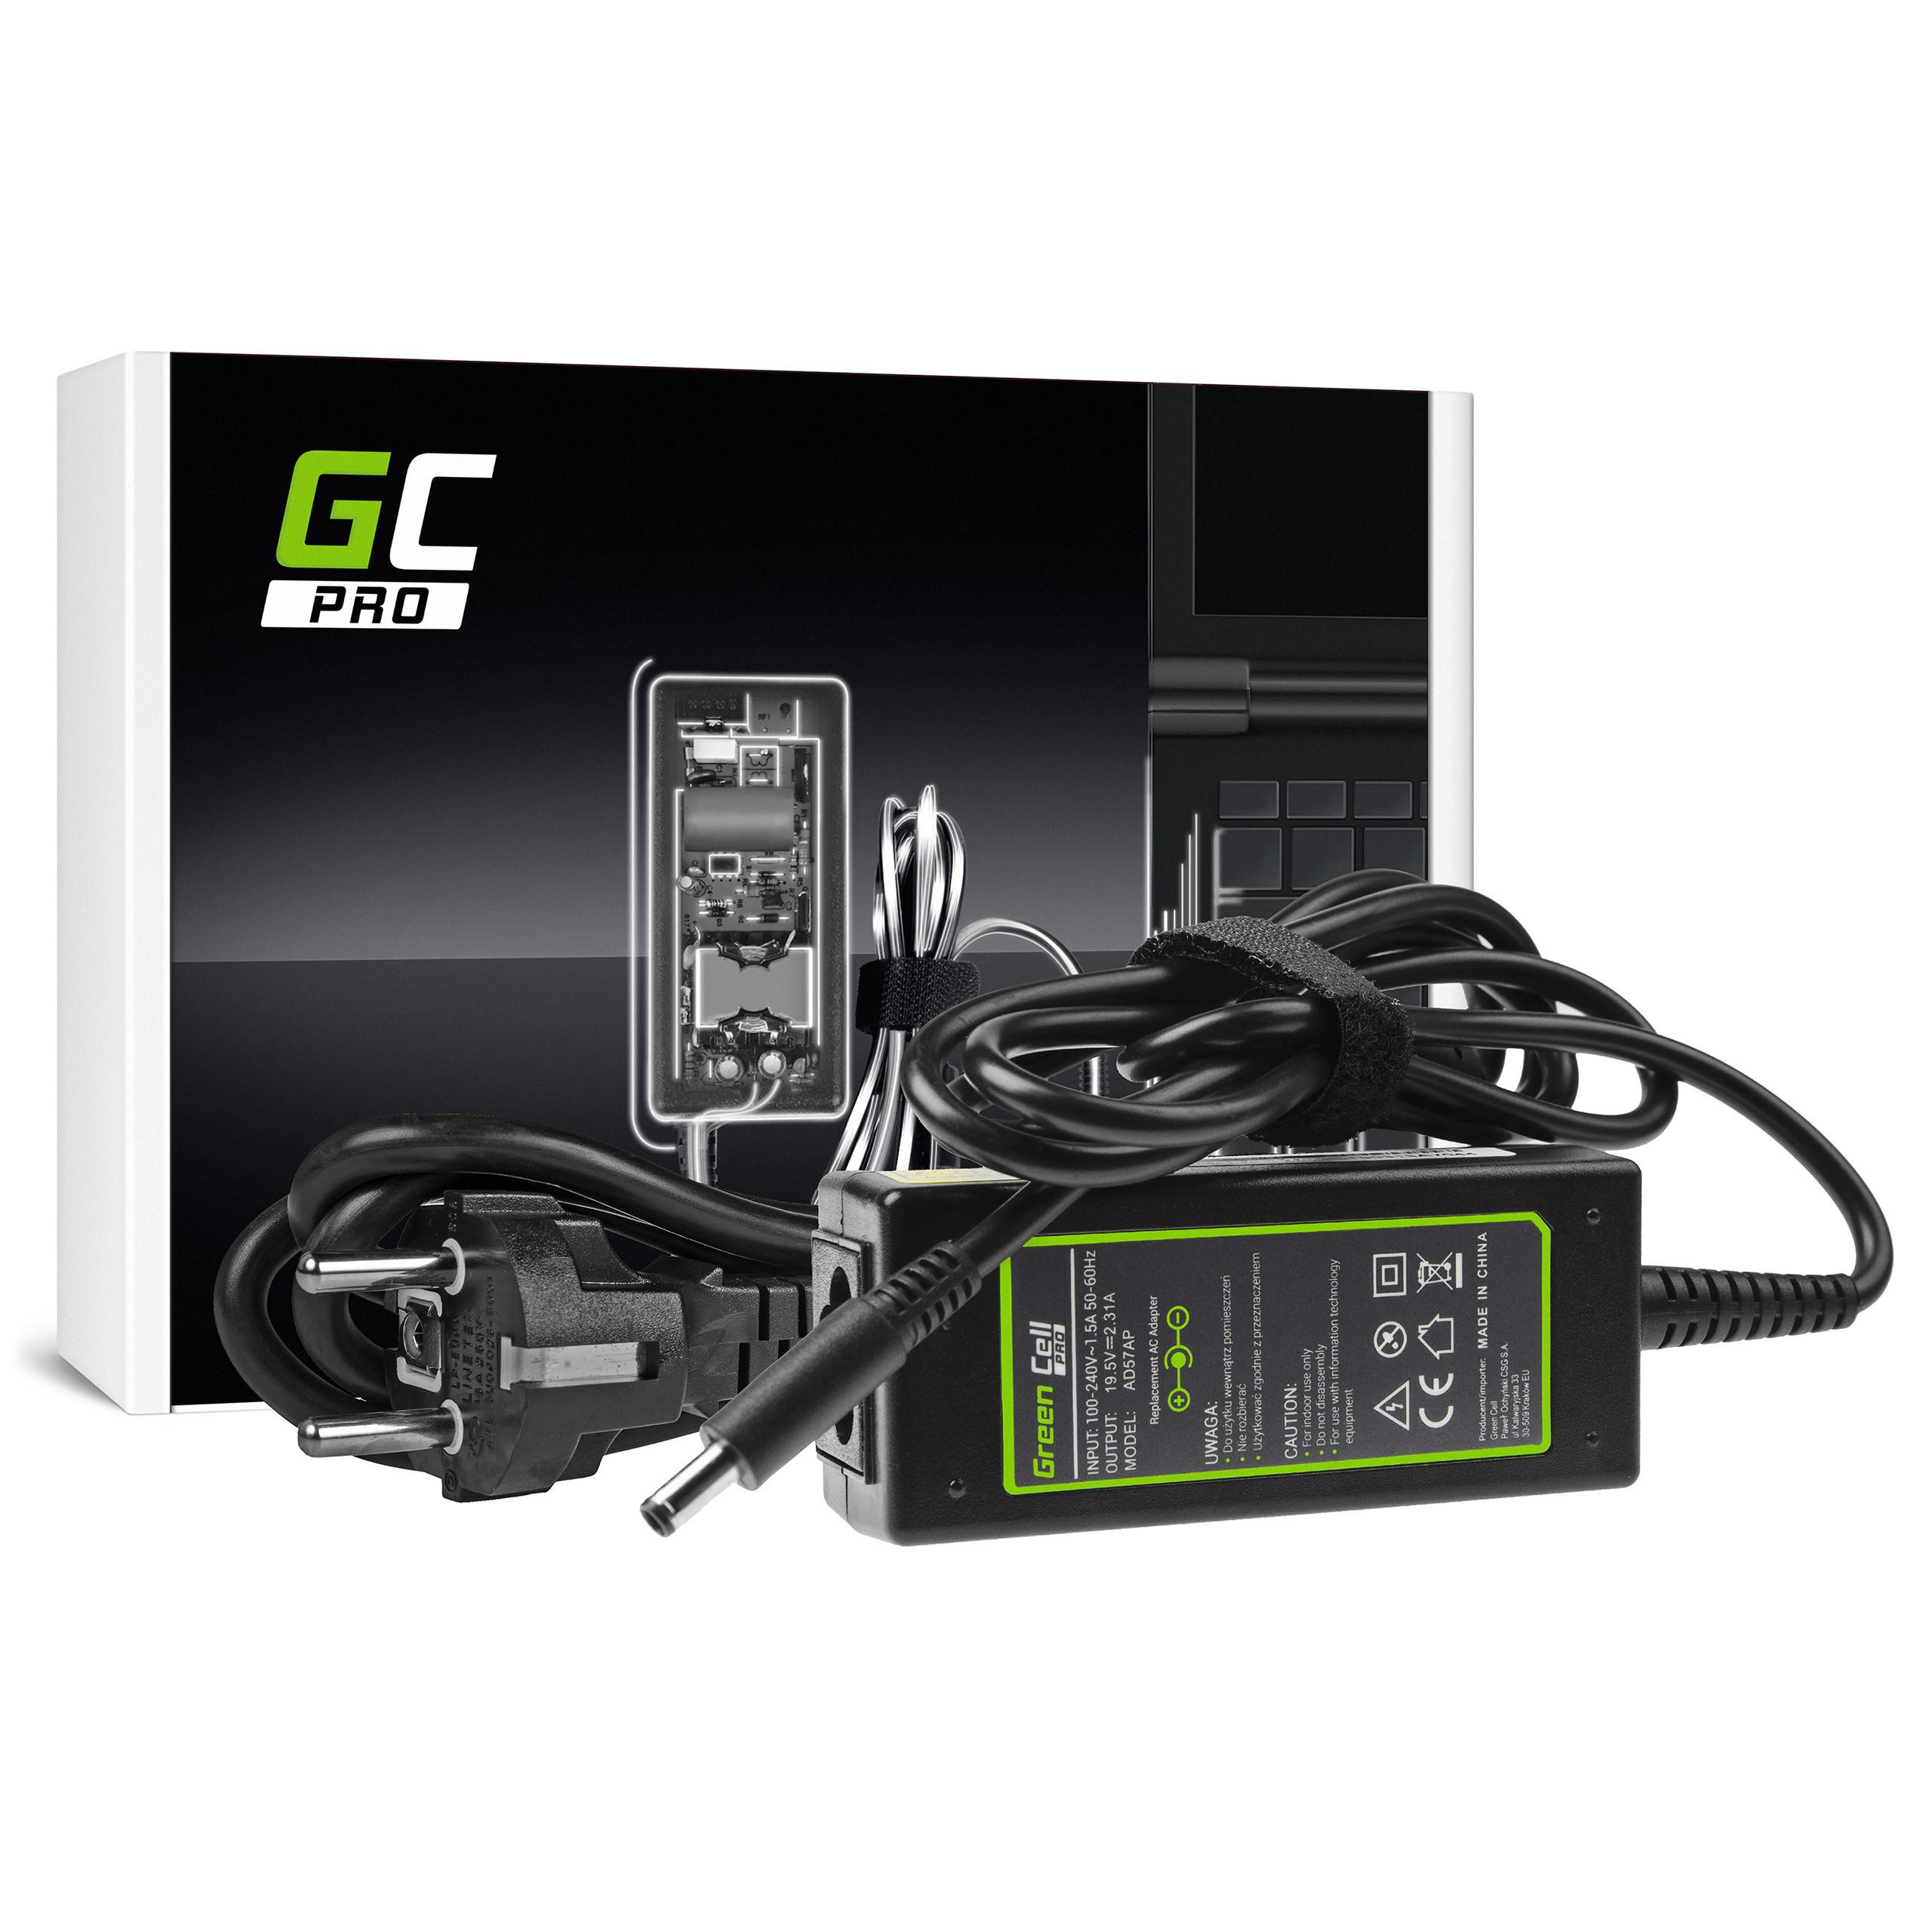 Green Cell AD57AP Adaptér Nabíječka Dell XPS 13 9343 9350 9360 Inspiron 15 3552 3567 5368 5551 5567 19.5V 45W